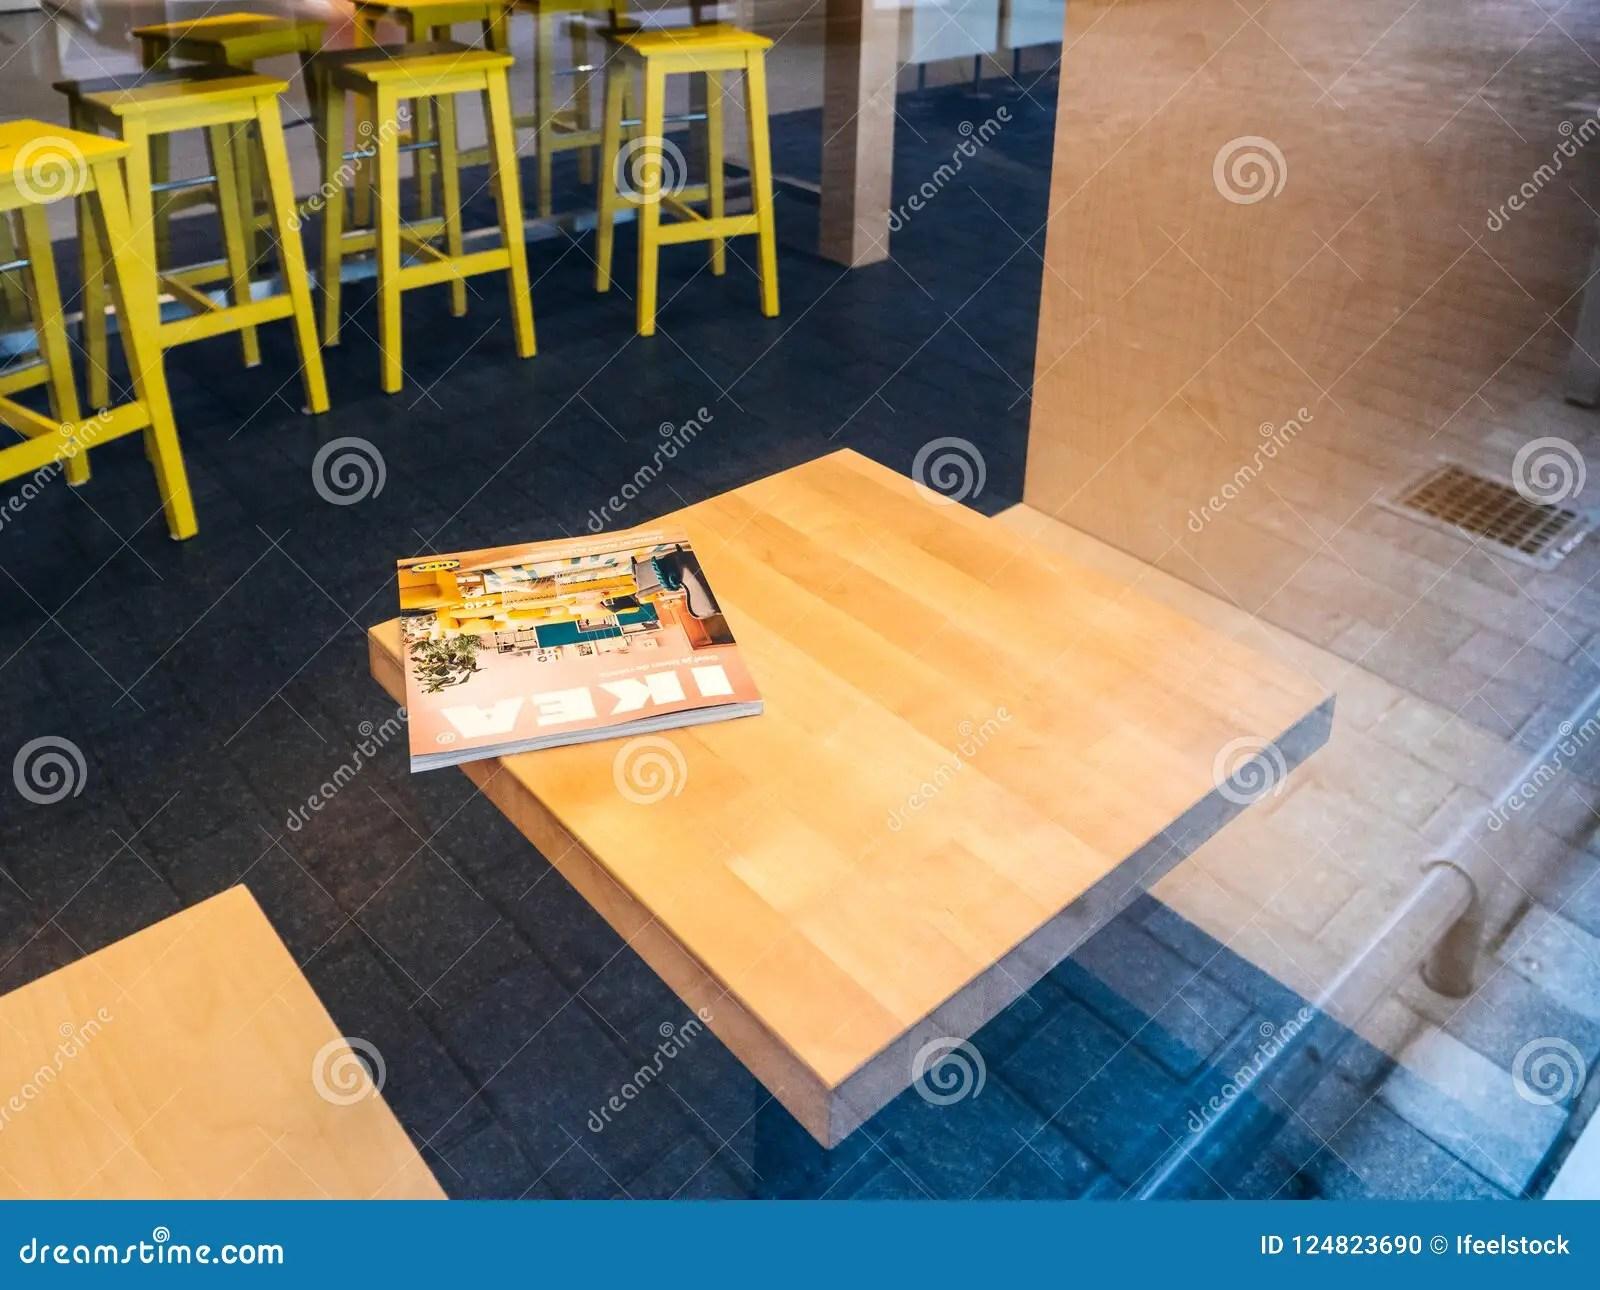 Ikea Catalogue On Cafe Table Inside Furniture Supermarket